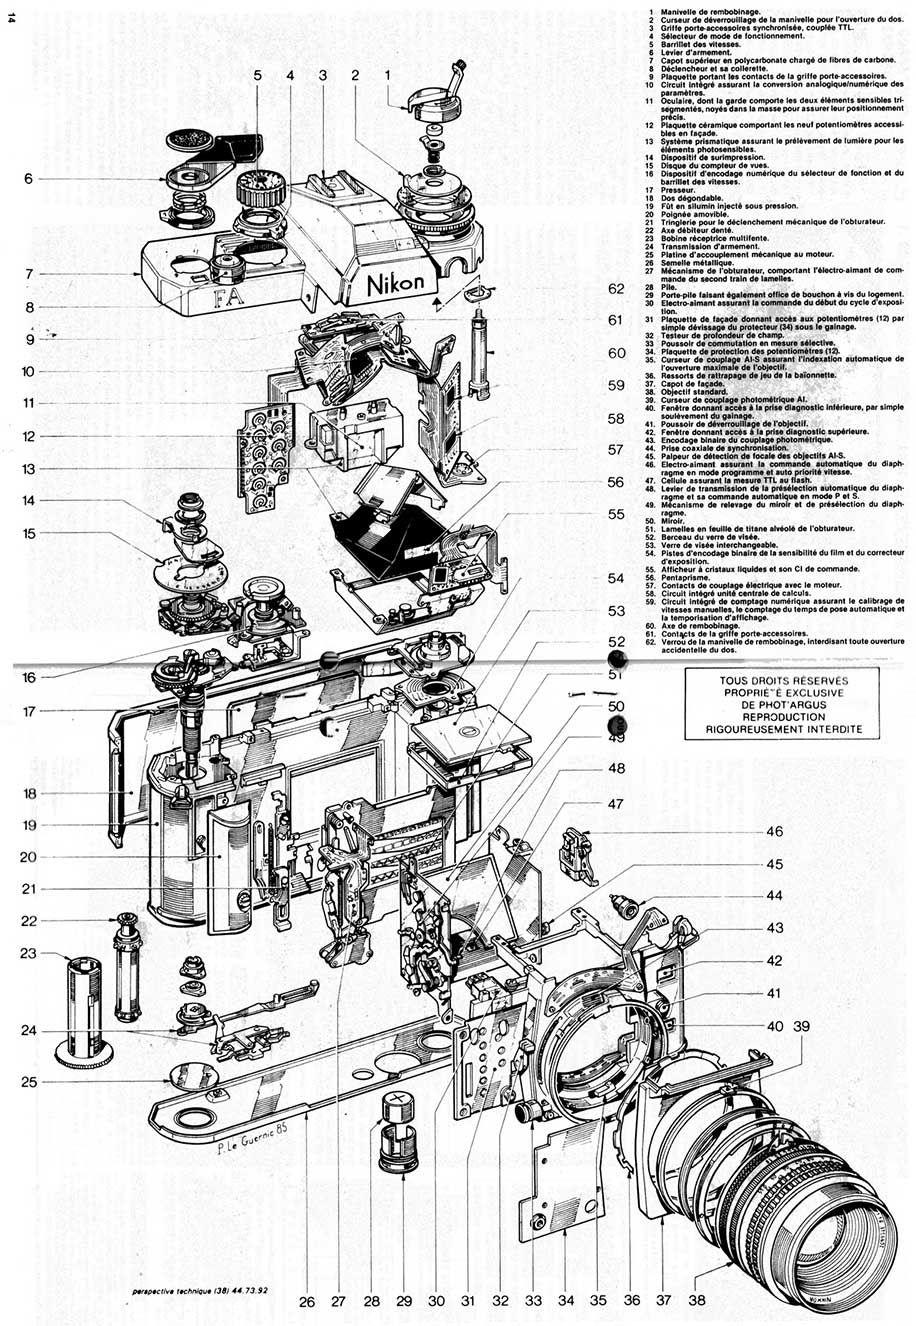 Enjoy the mechanical schematics of those old Nikon F film